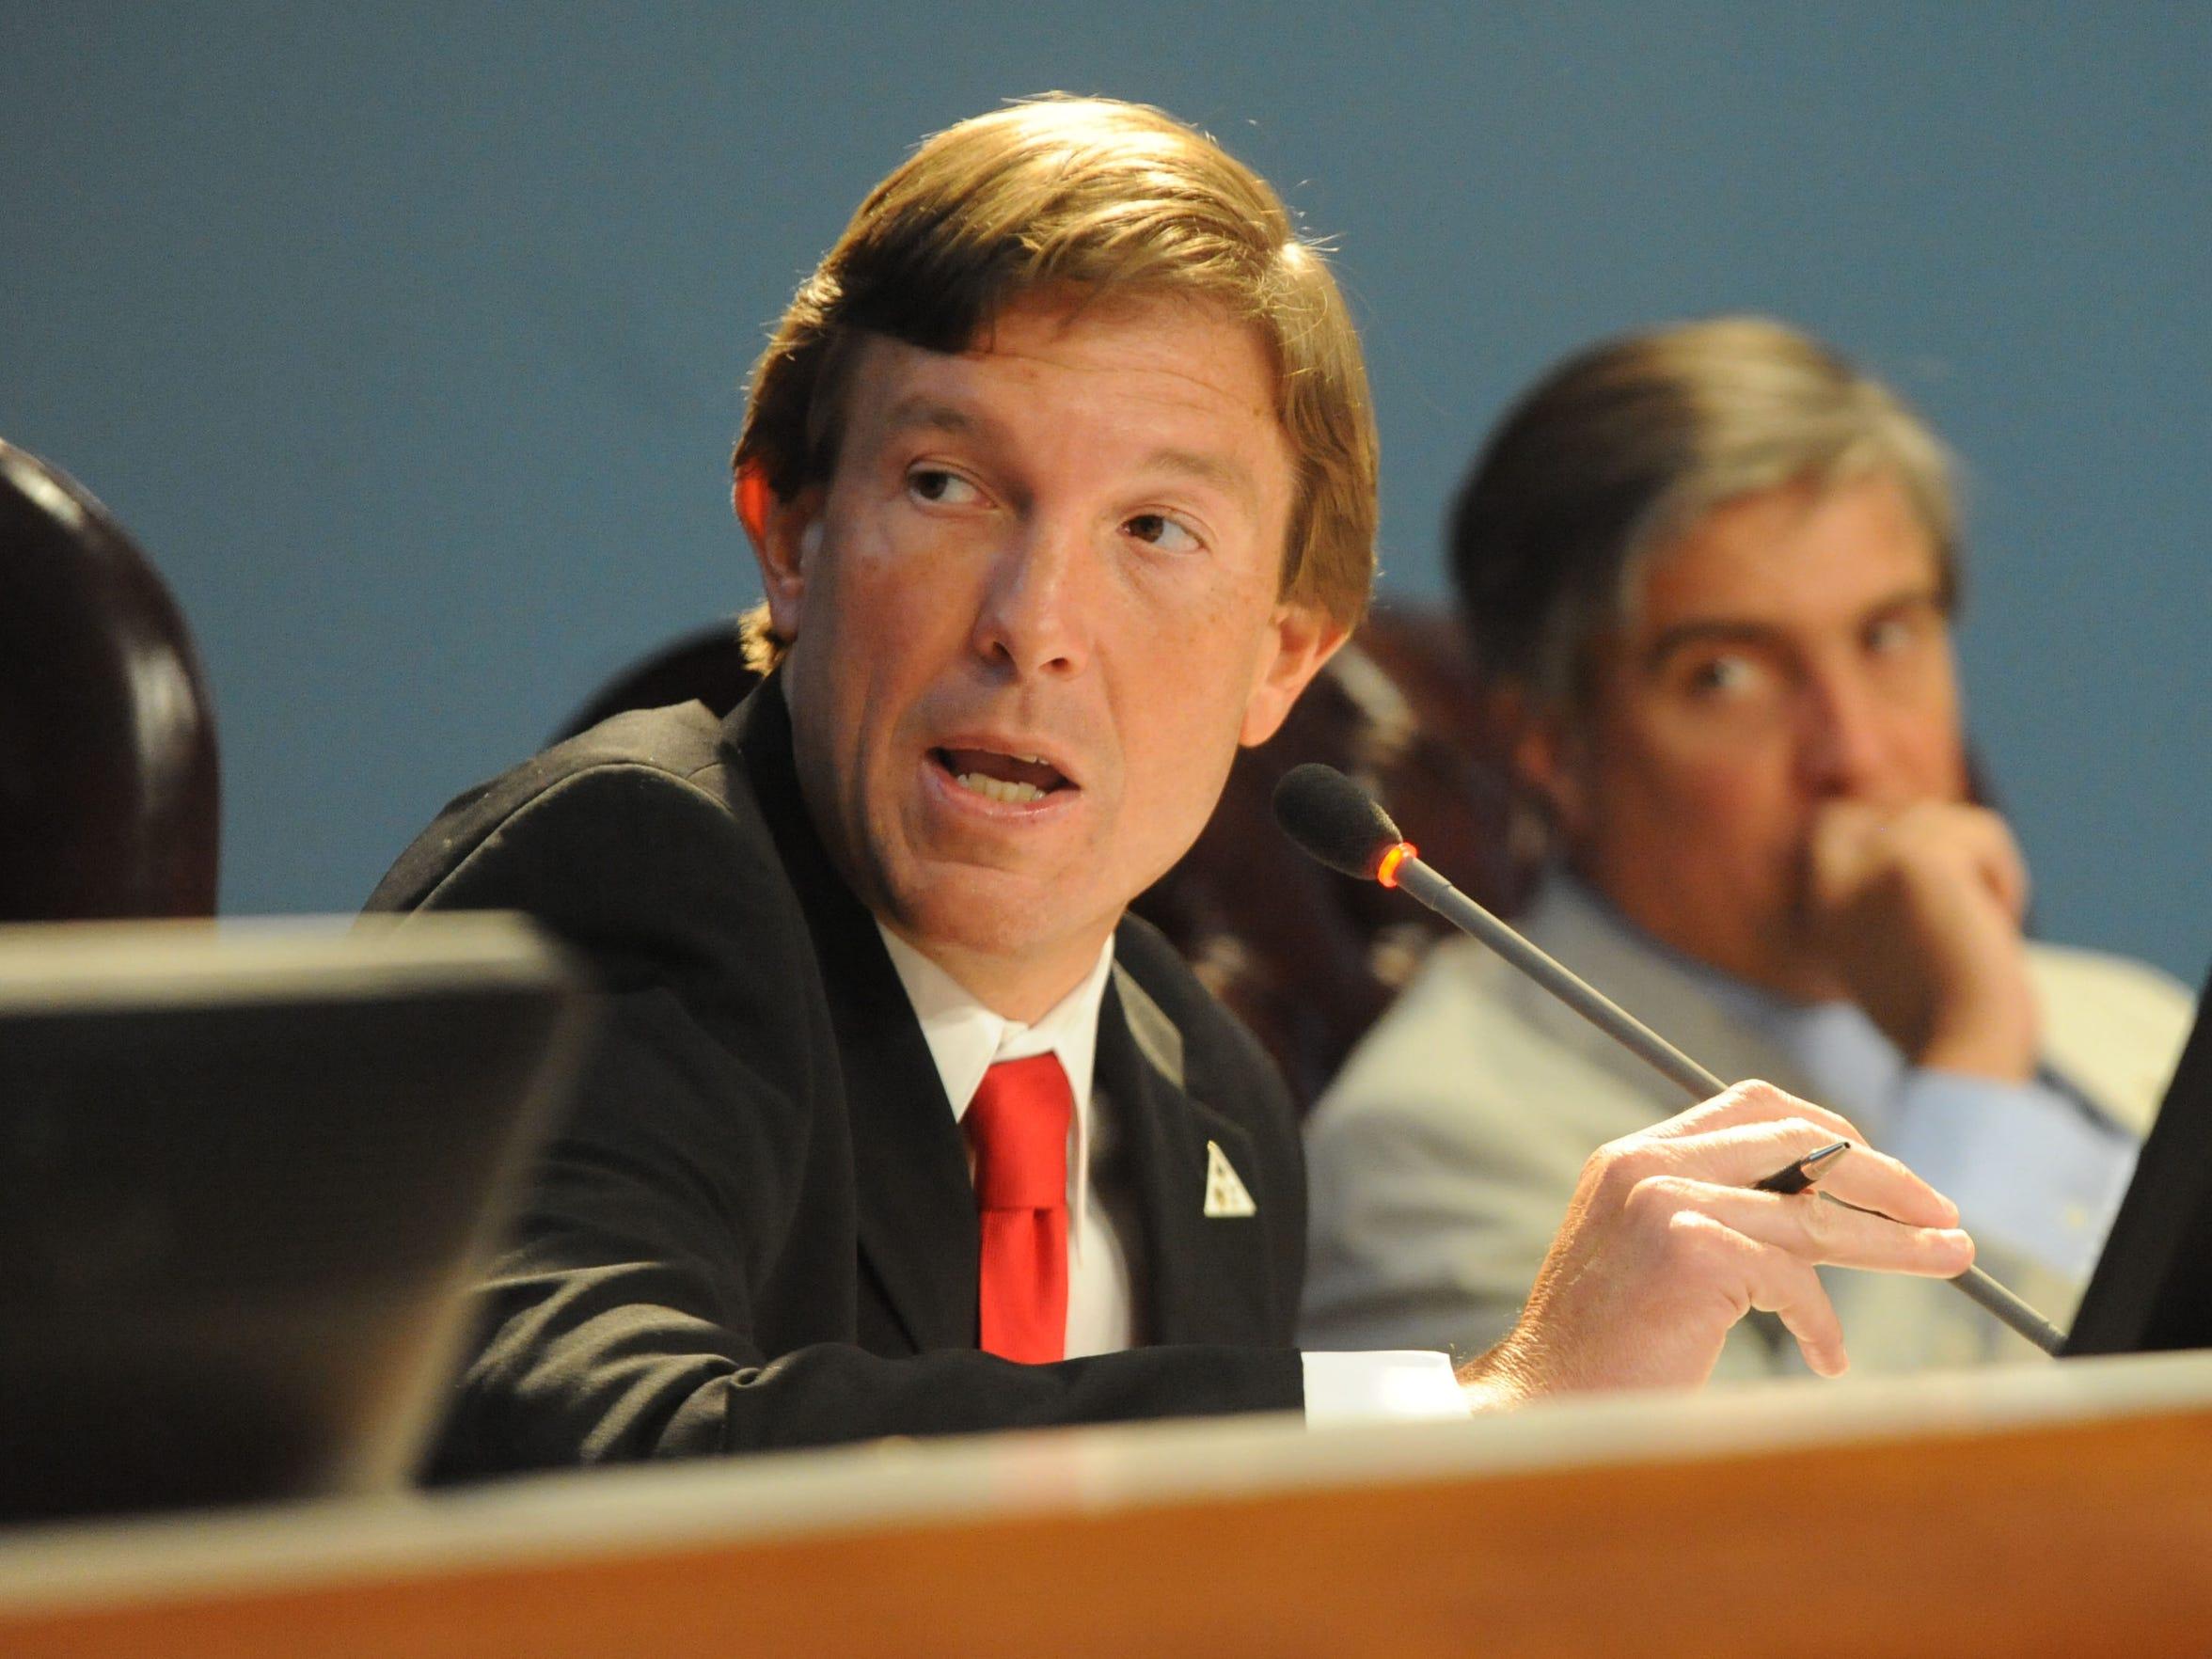 Commissioner Steven Barry